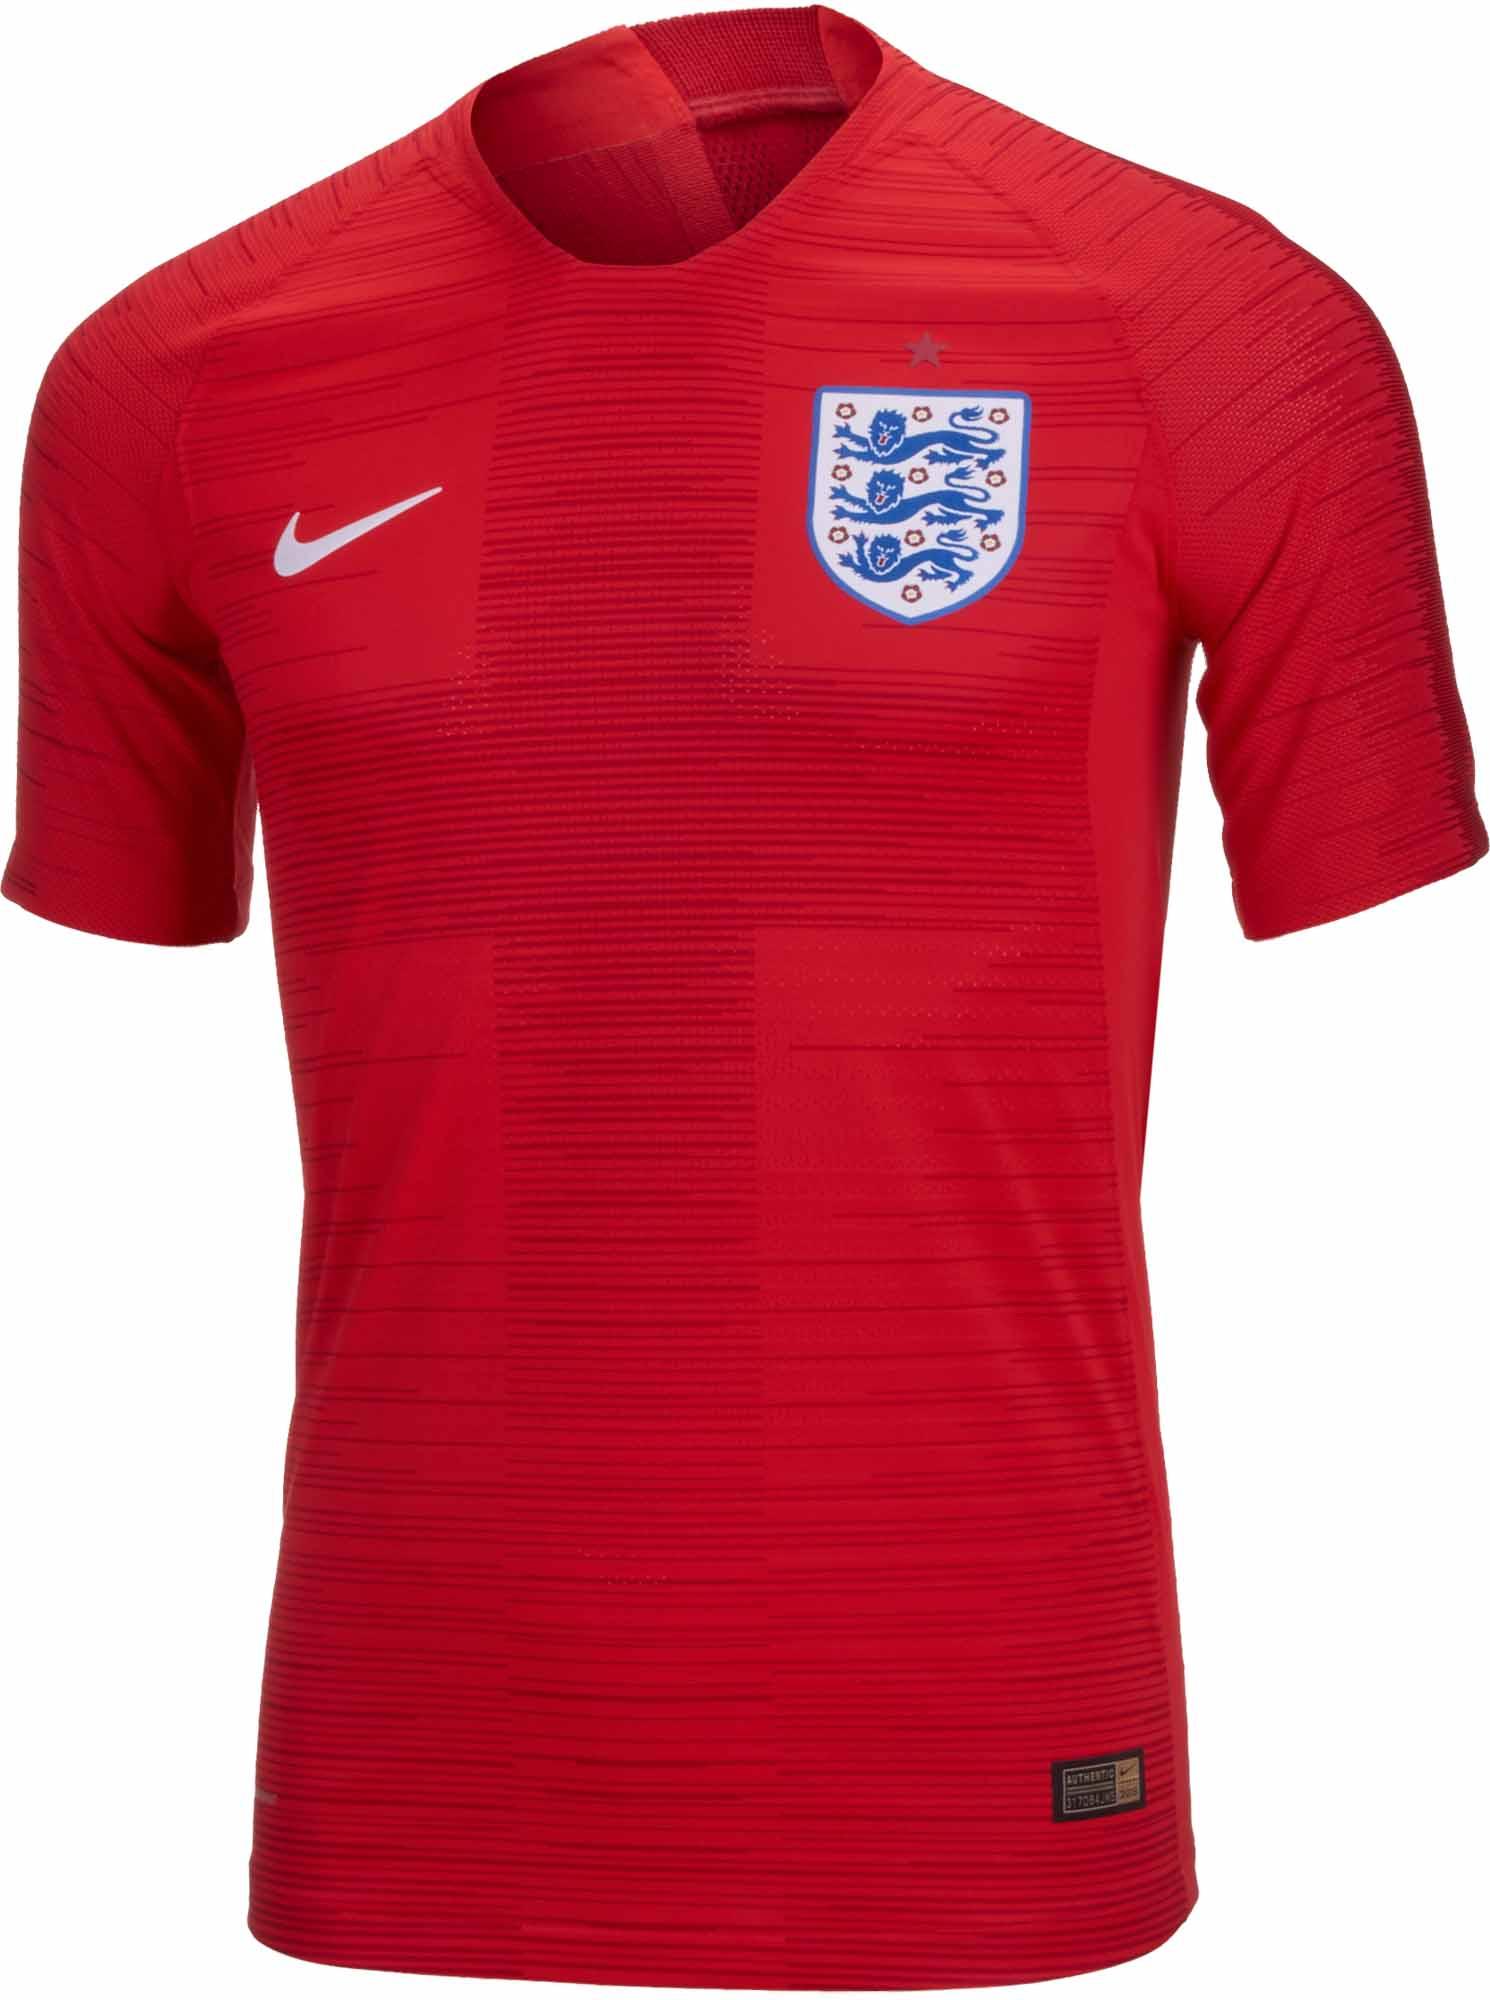 e4314613b1a Nike England Away Match Jersey 2018-19 - SoccerPro.com